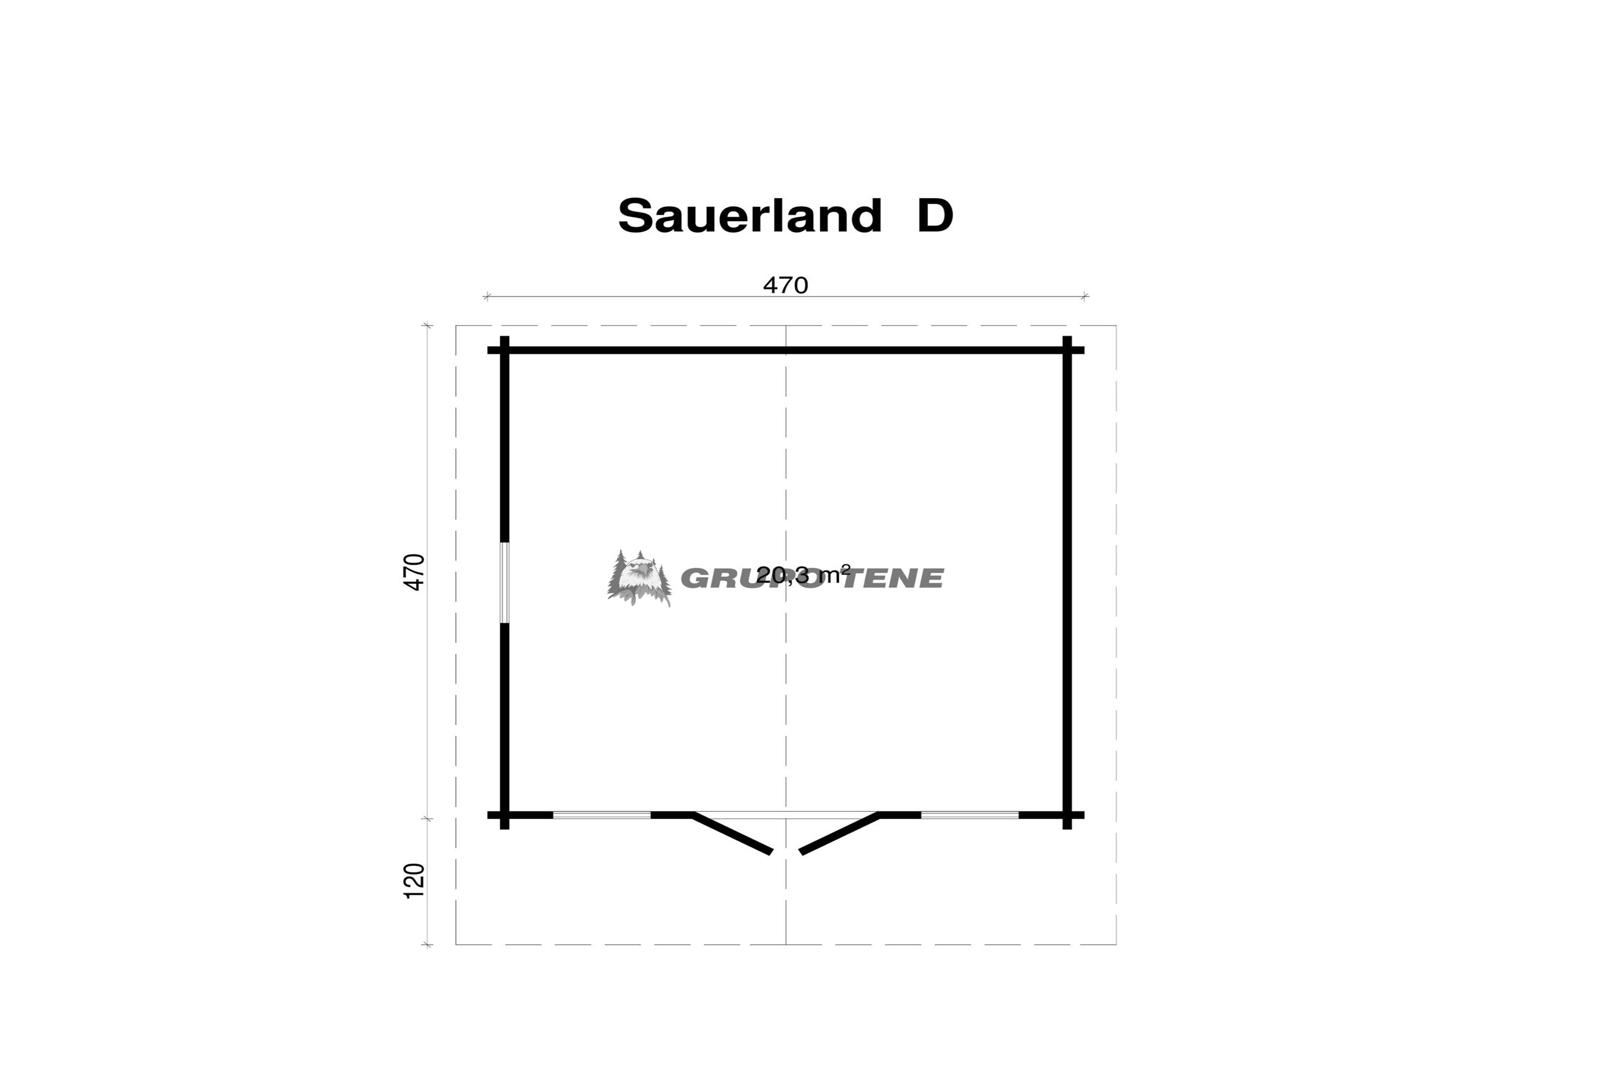 plano sauerland d